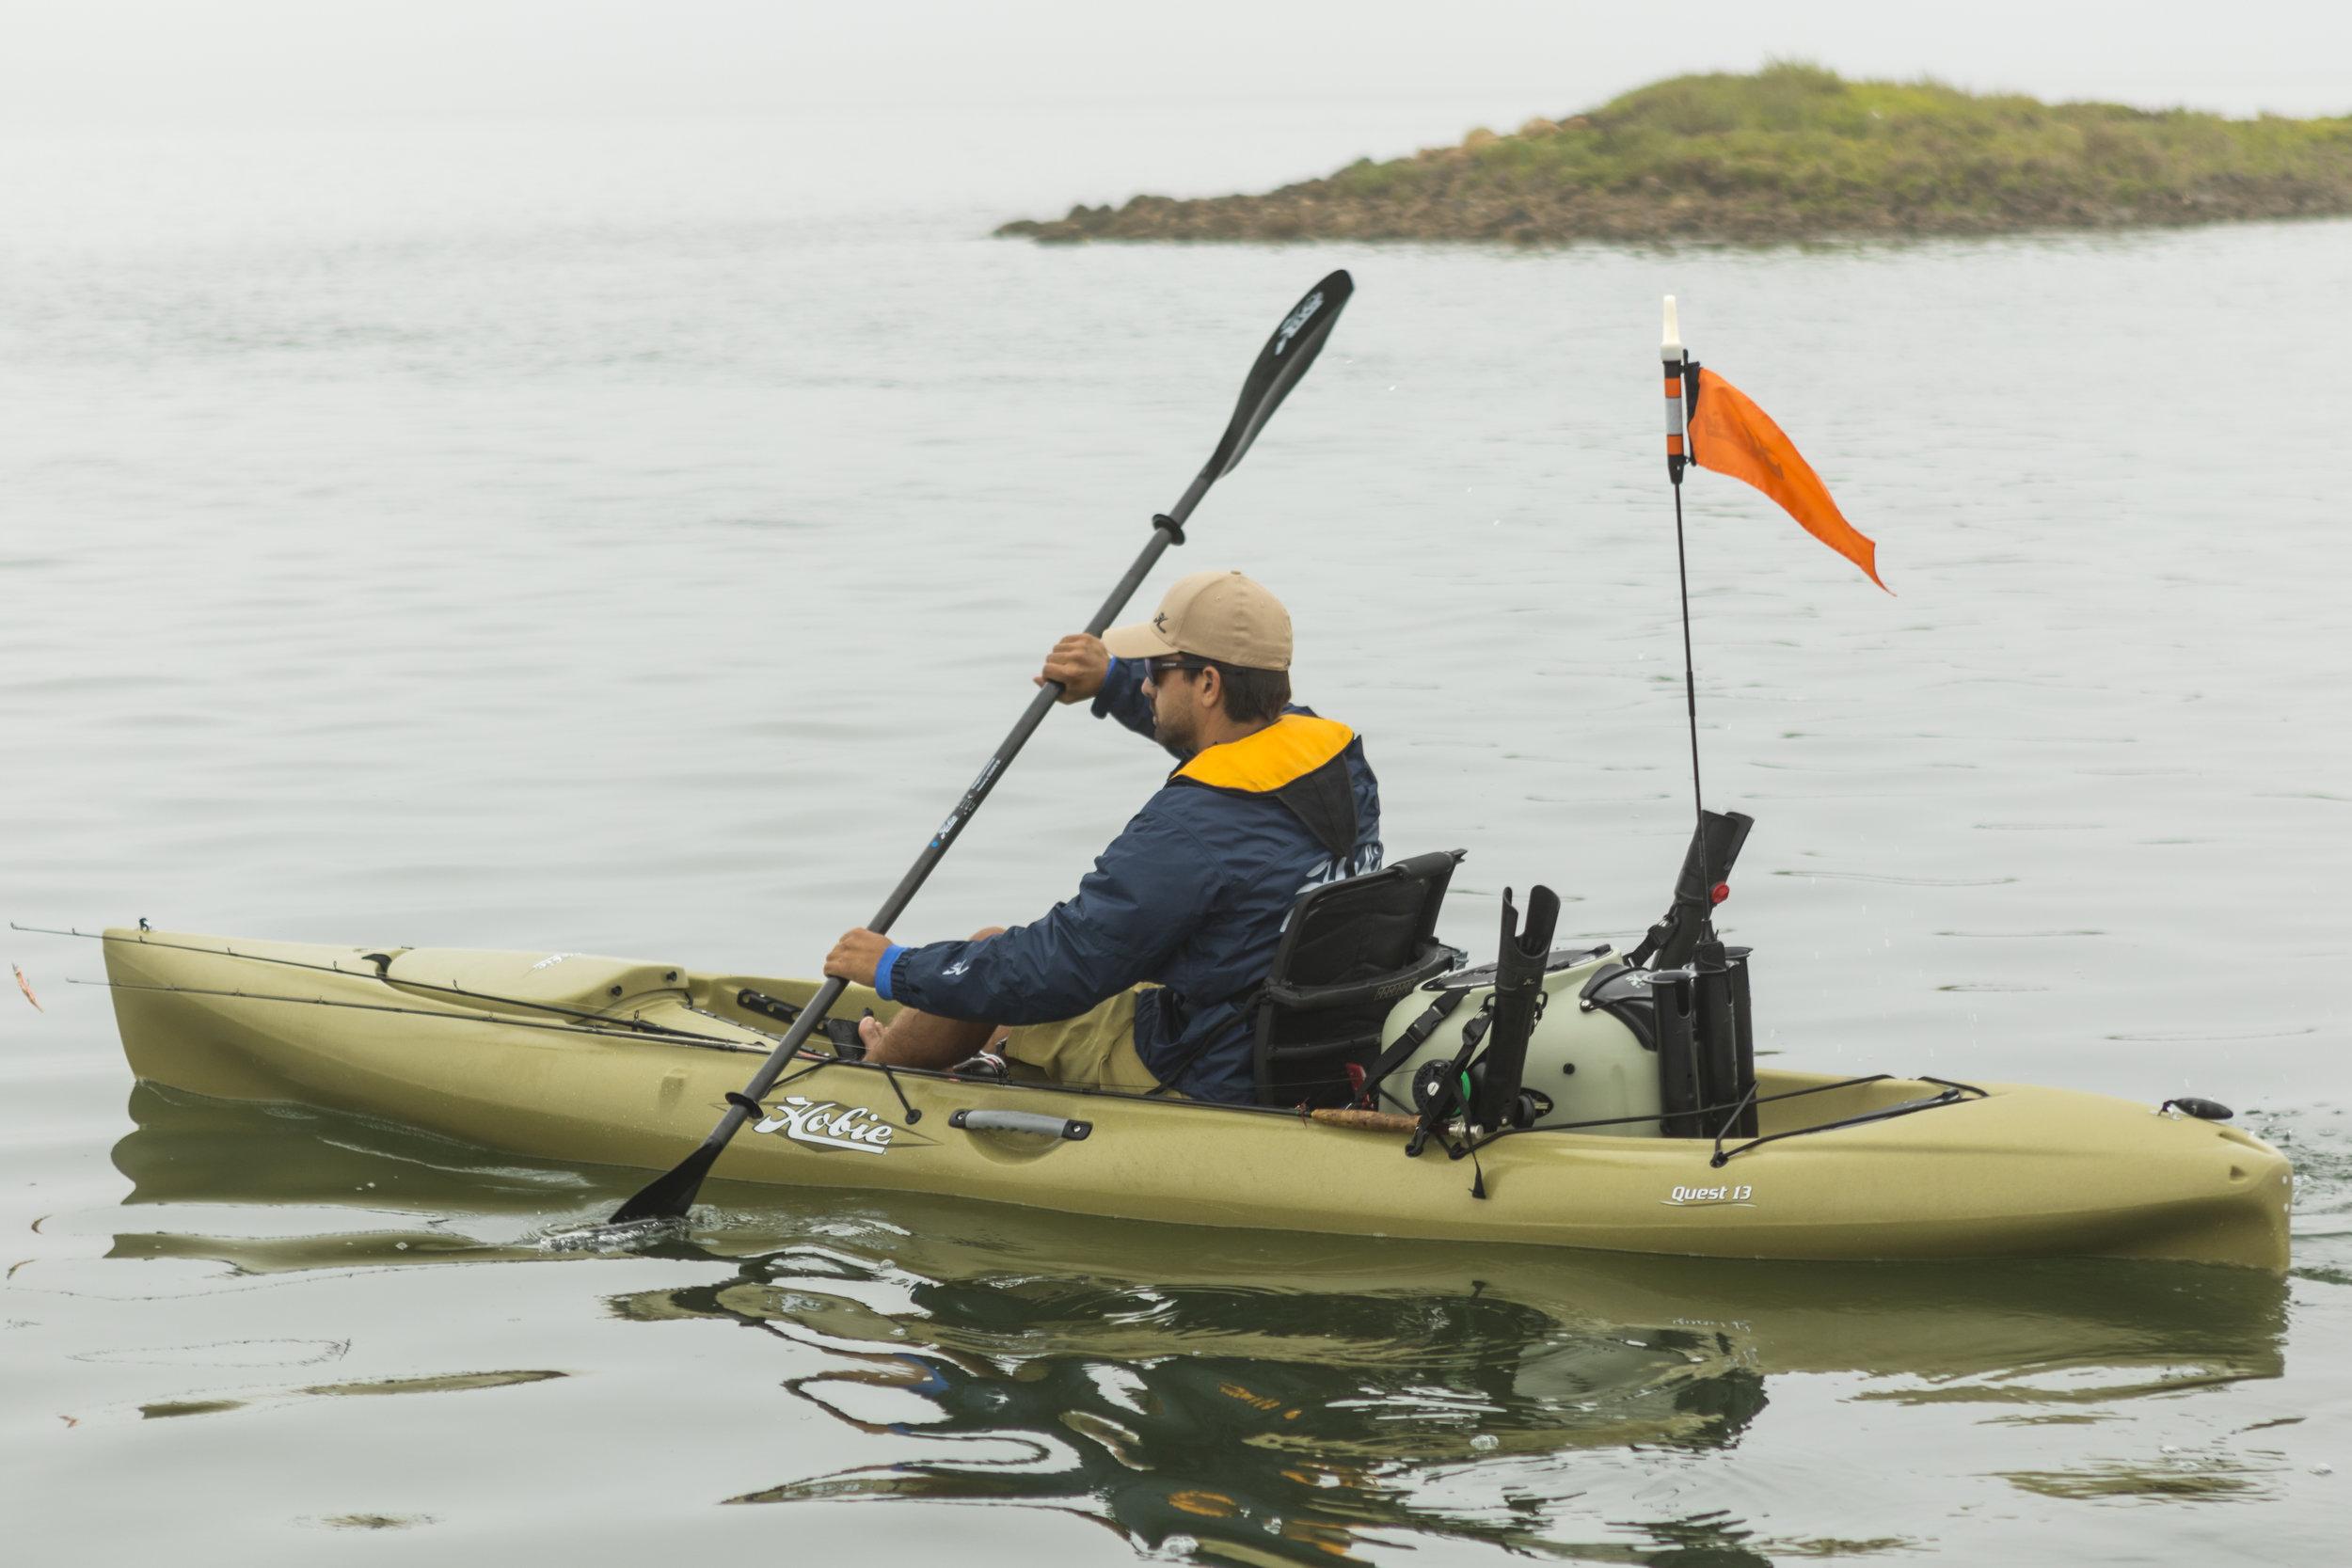 Quest13_fishing_Howie_olive_paddling_9132_full.jpg